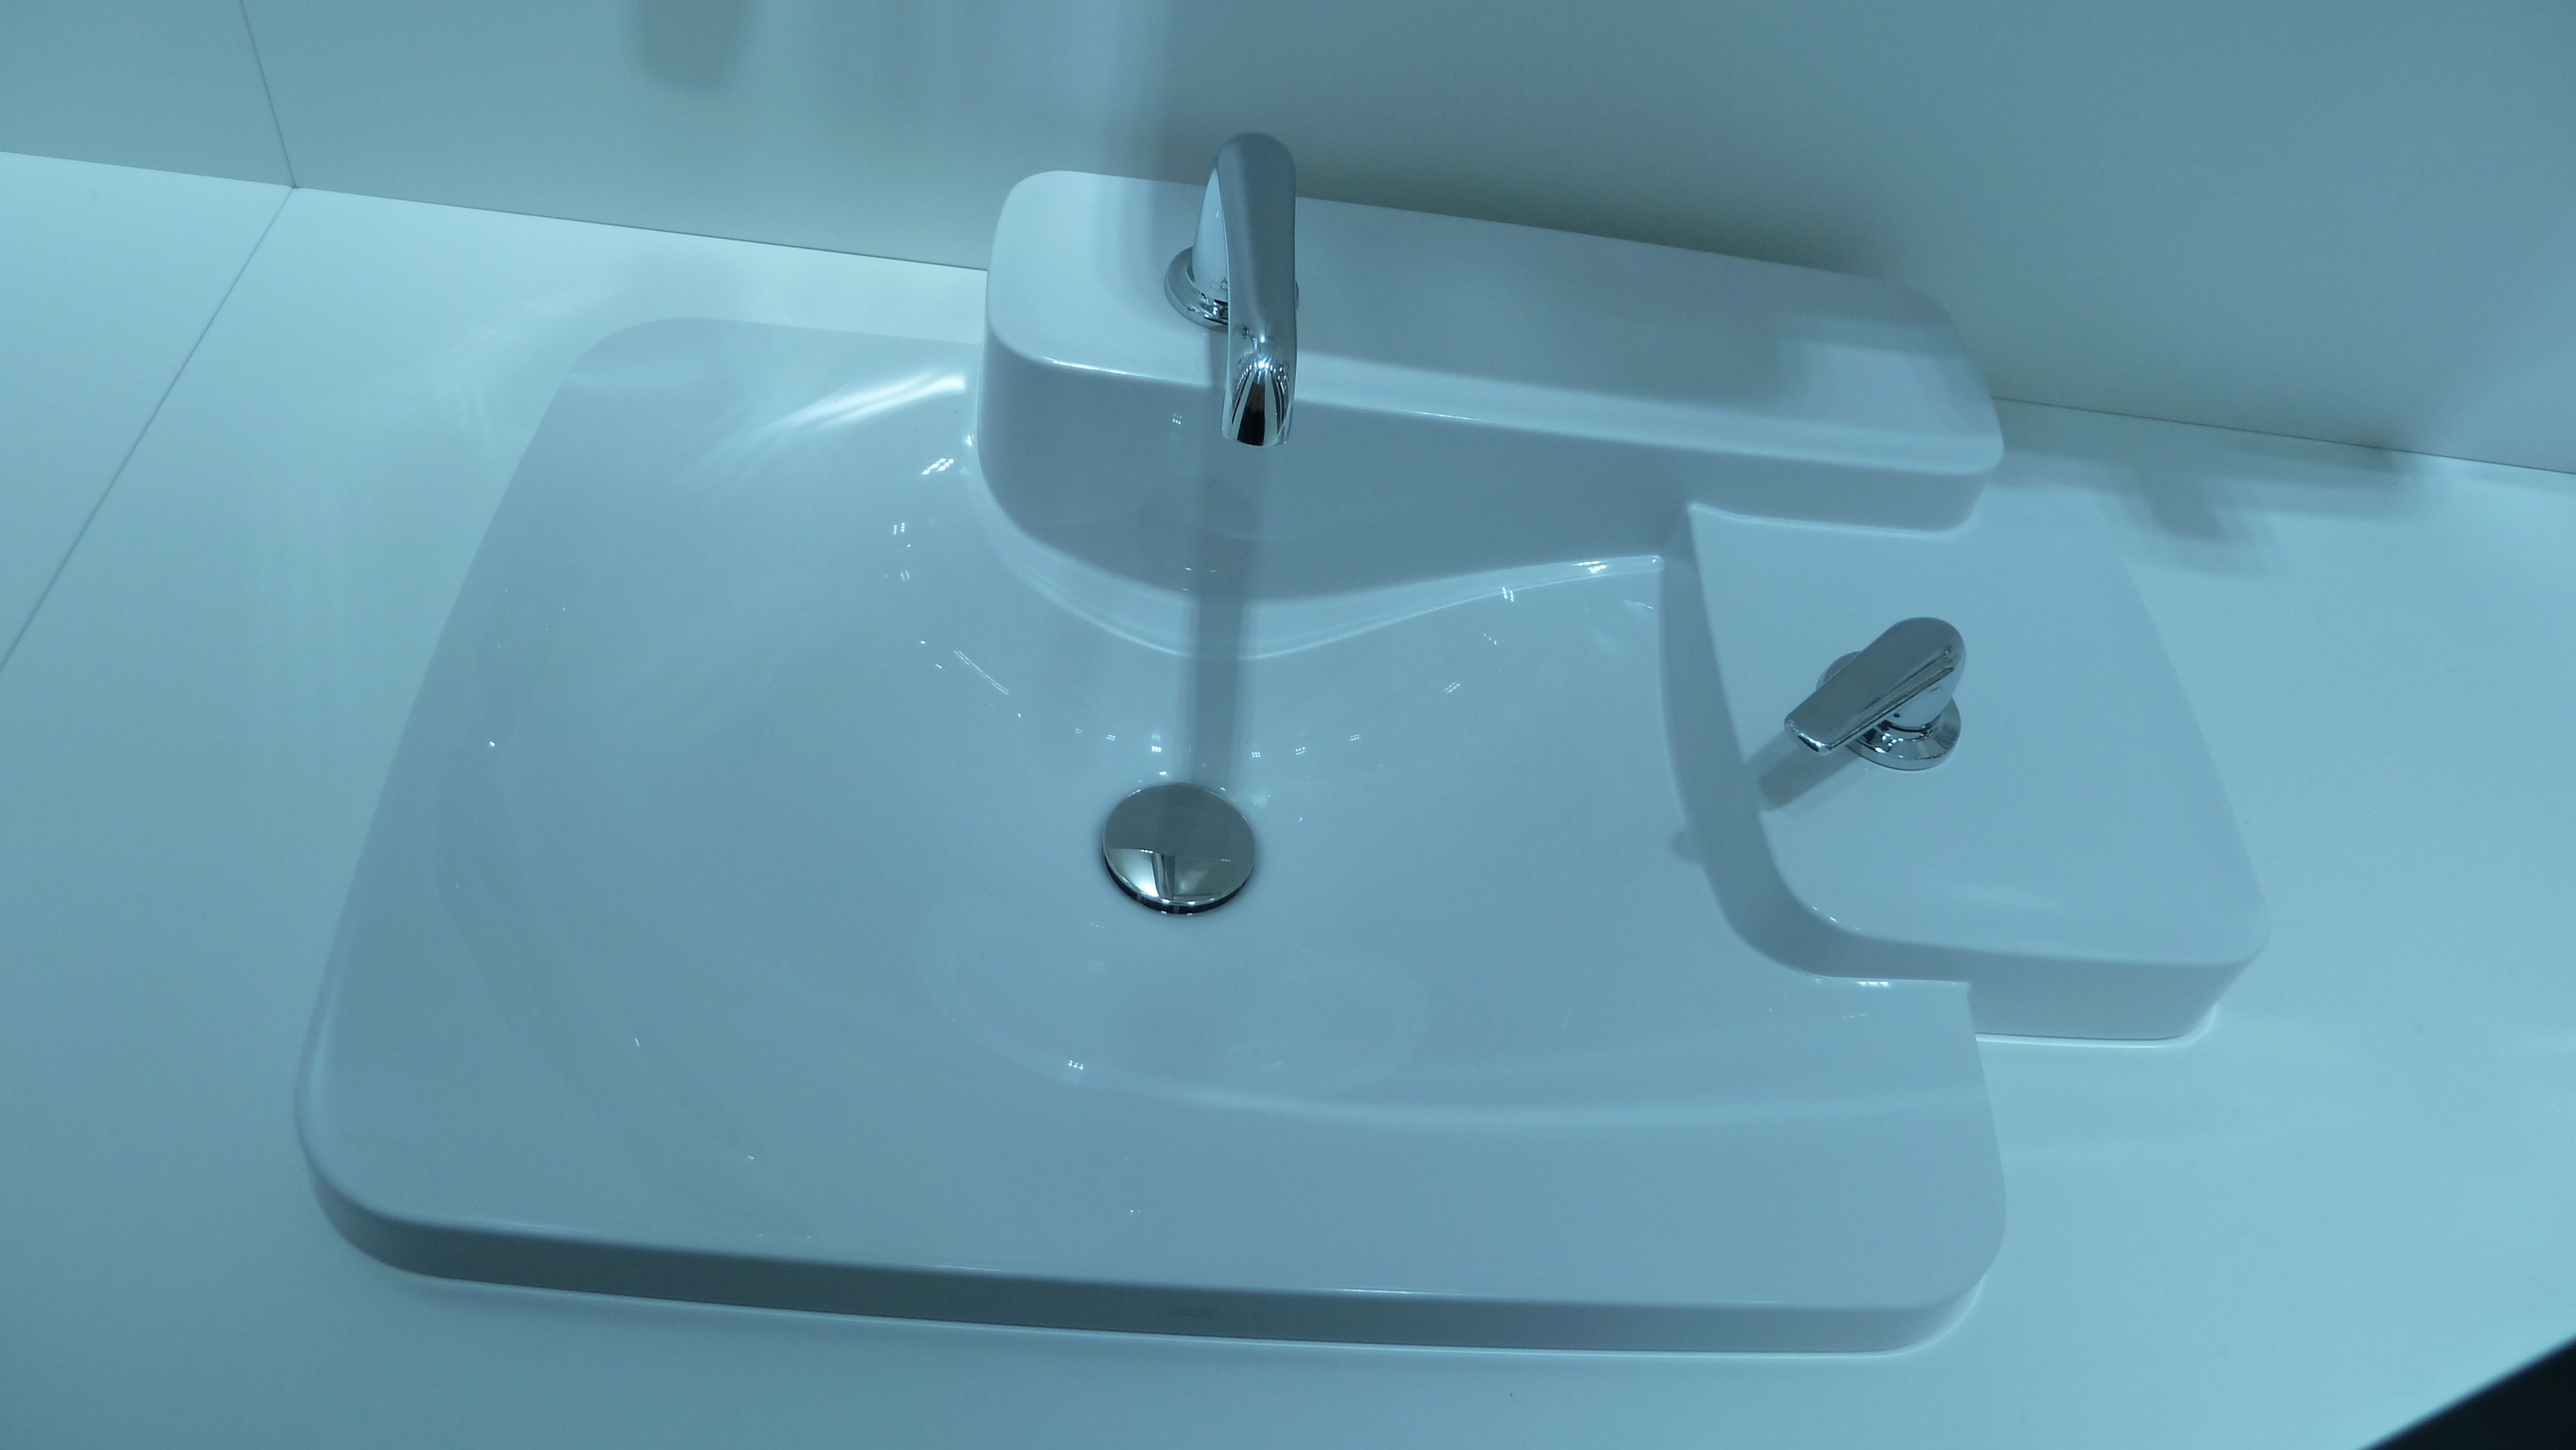 Modern Hansgrohe Bathroom Faucets Ornament - Bathroom - knawi.com